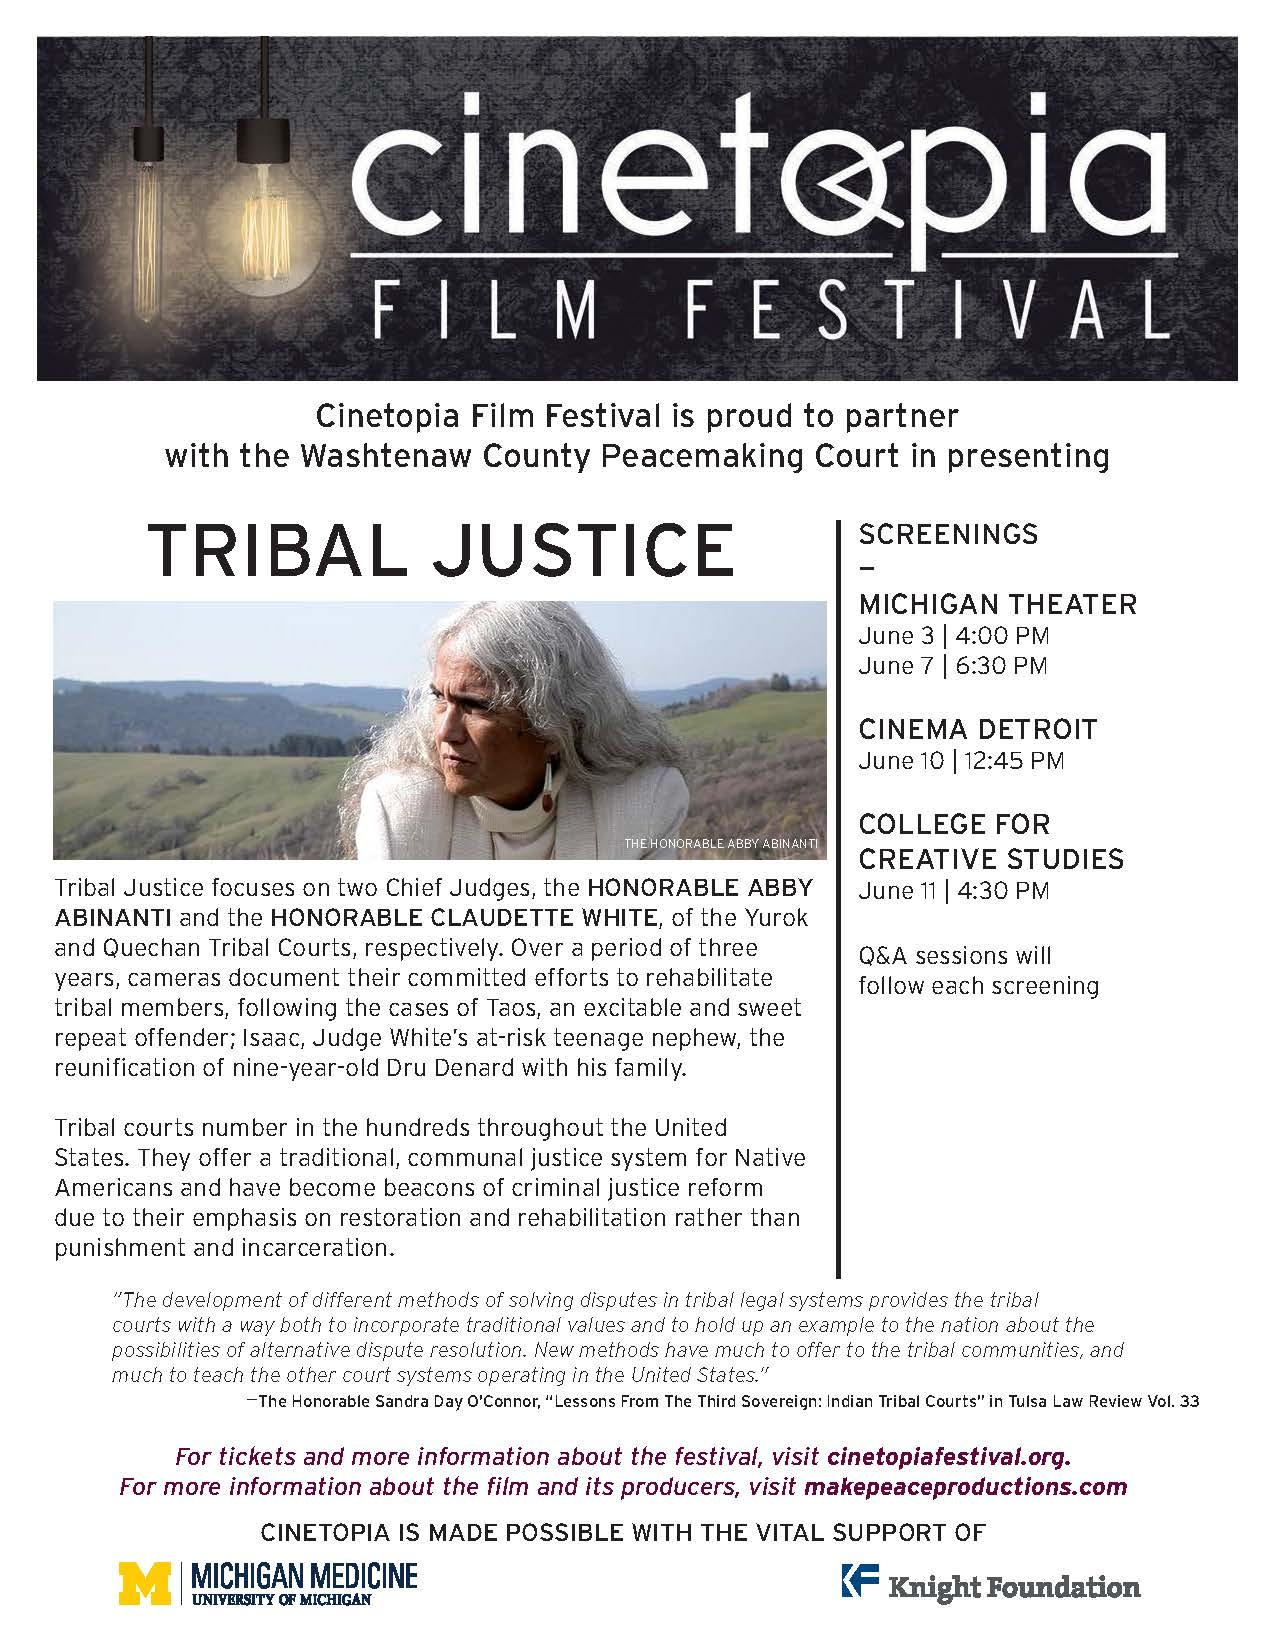 TribalJustice_flyer